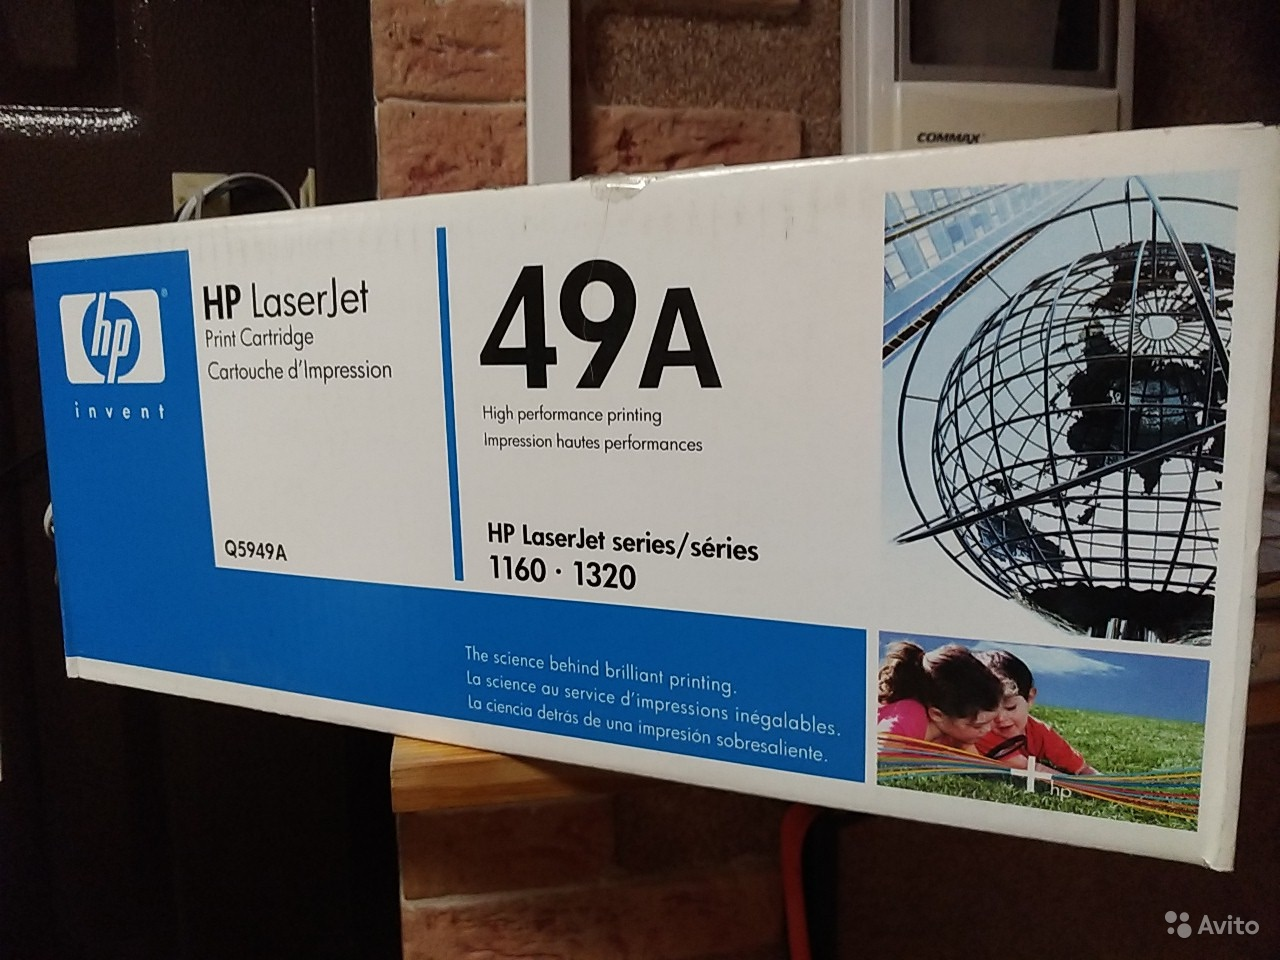 Новый картридж HP 49a в коробке